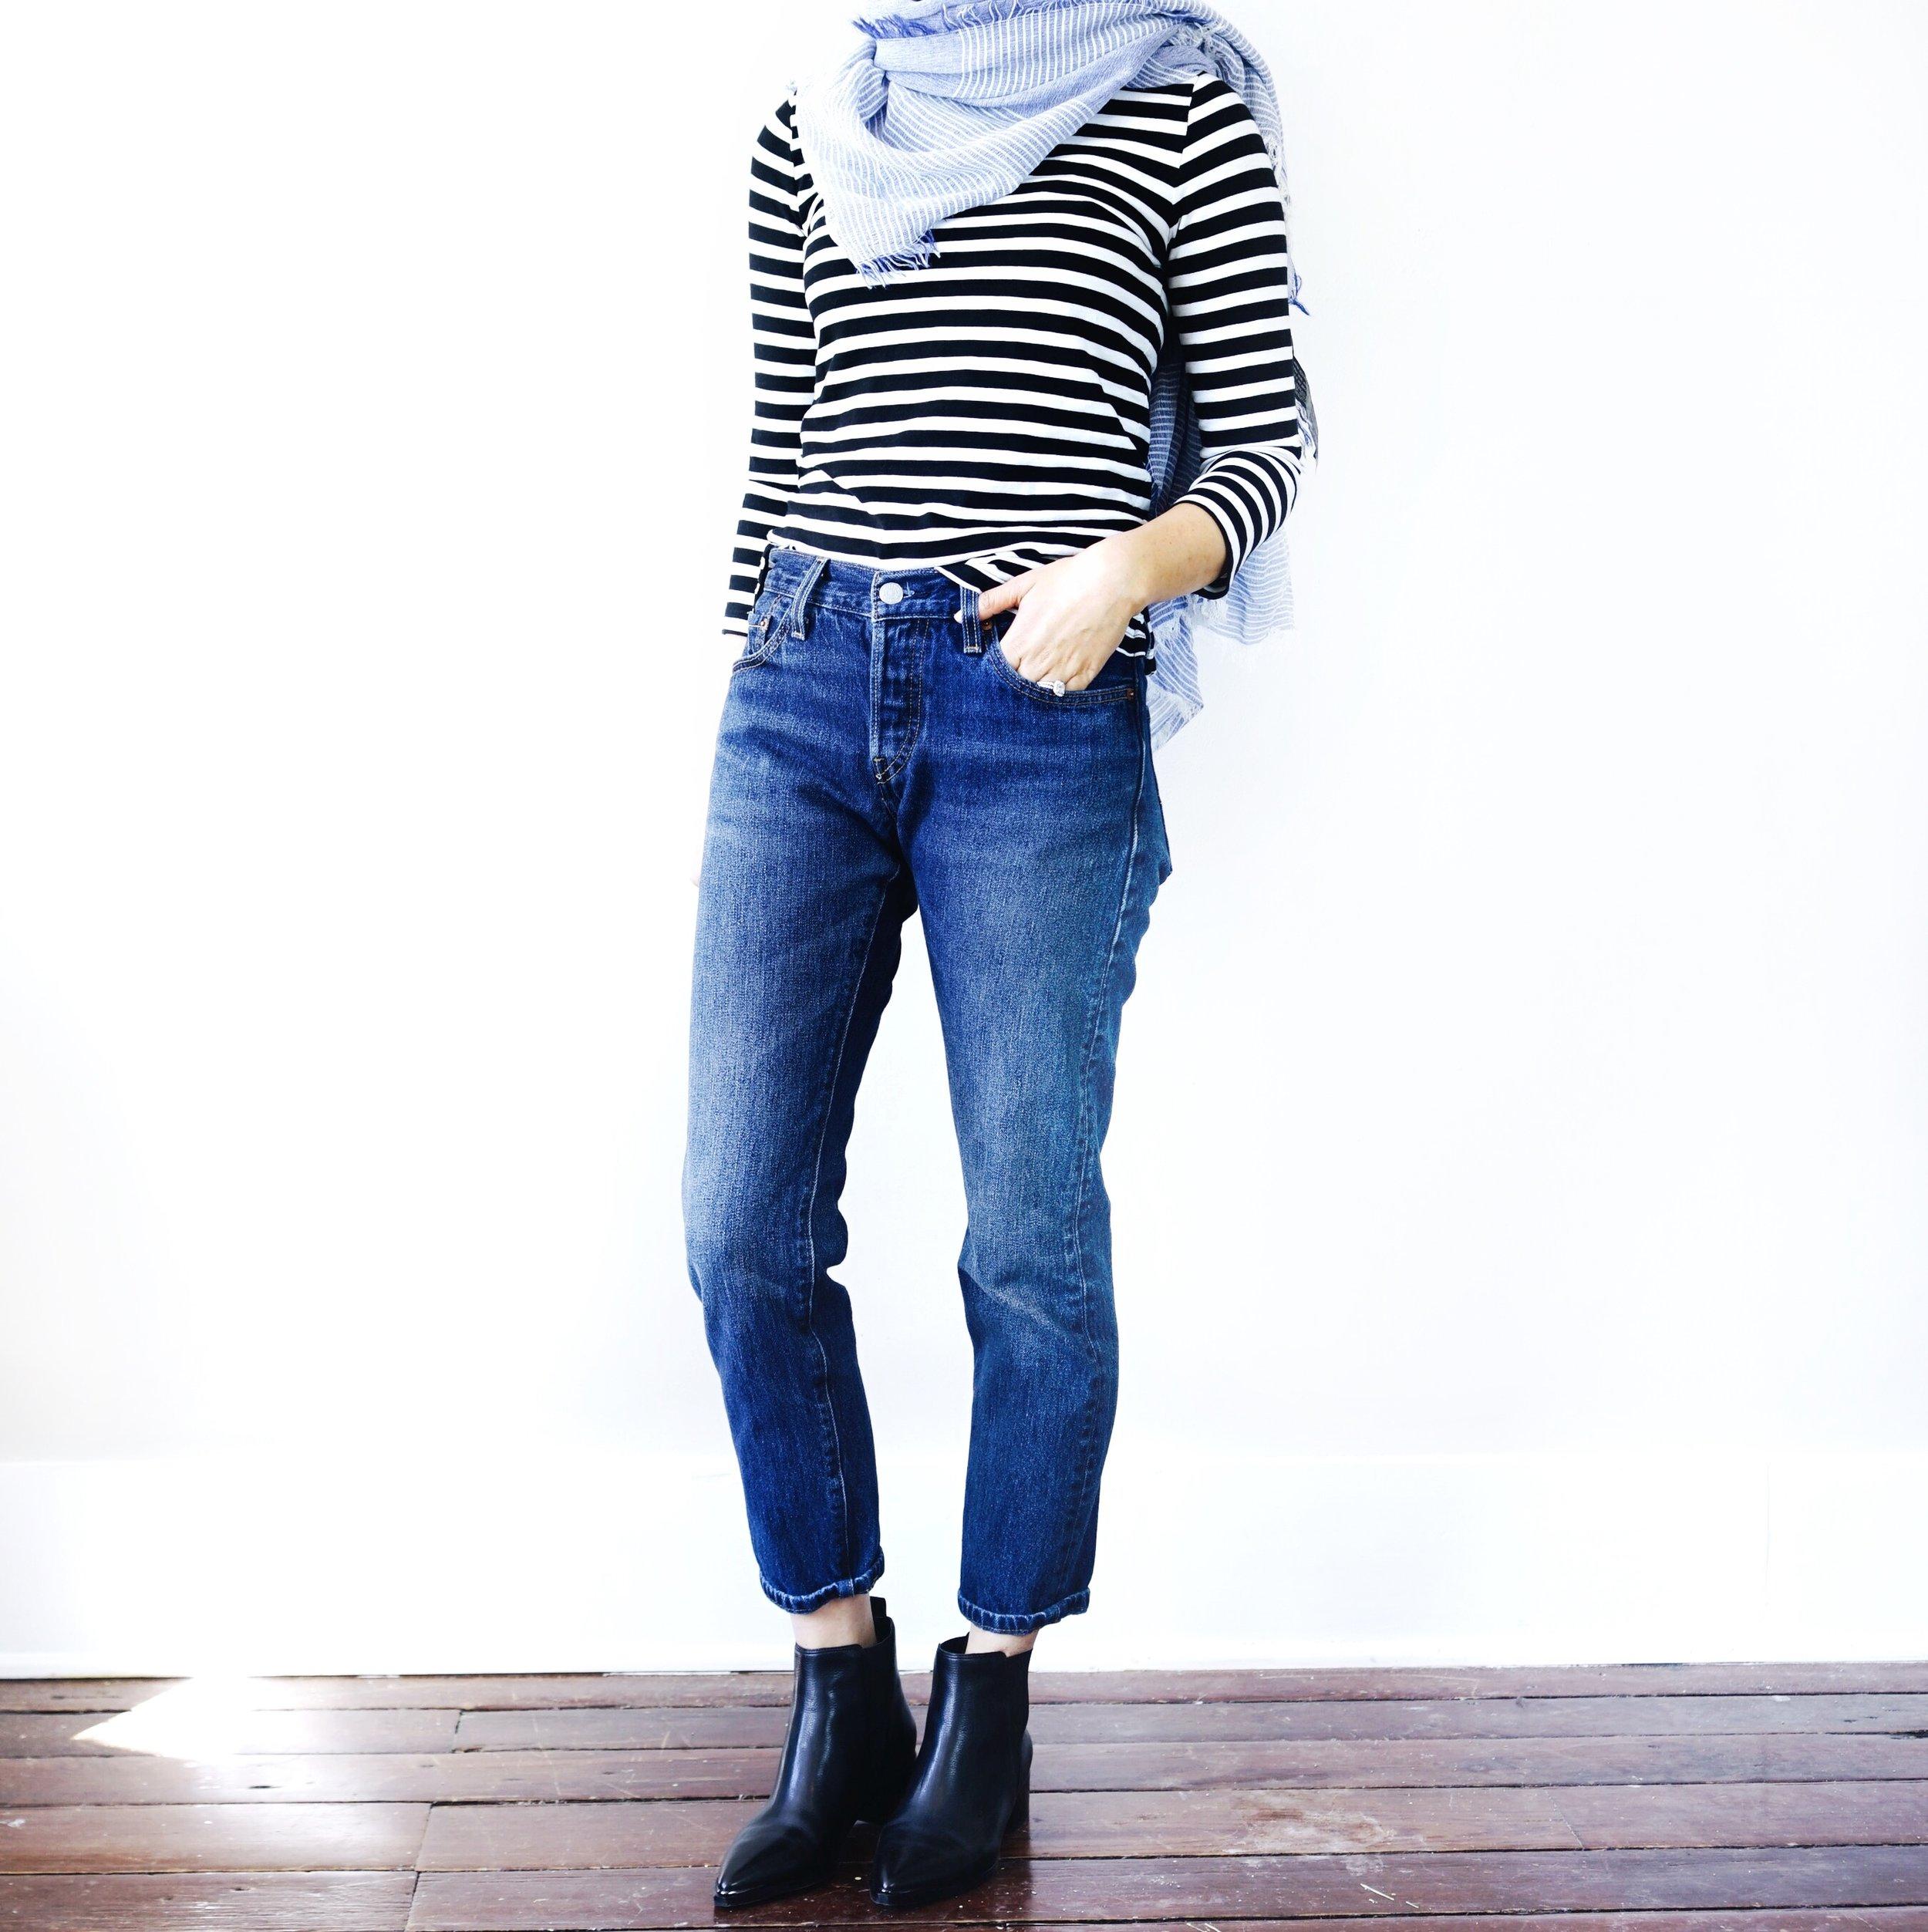 audrey-a-la-mode-capsule-wardrobe-striped-shirt-levis-jeans-marc-fisher-yale-booties.jpg